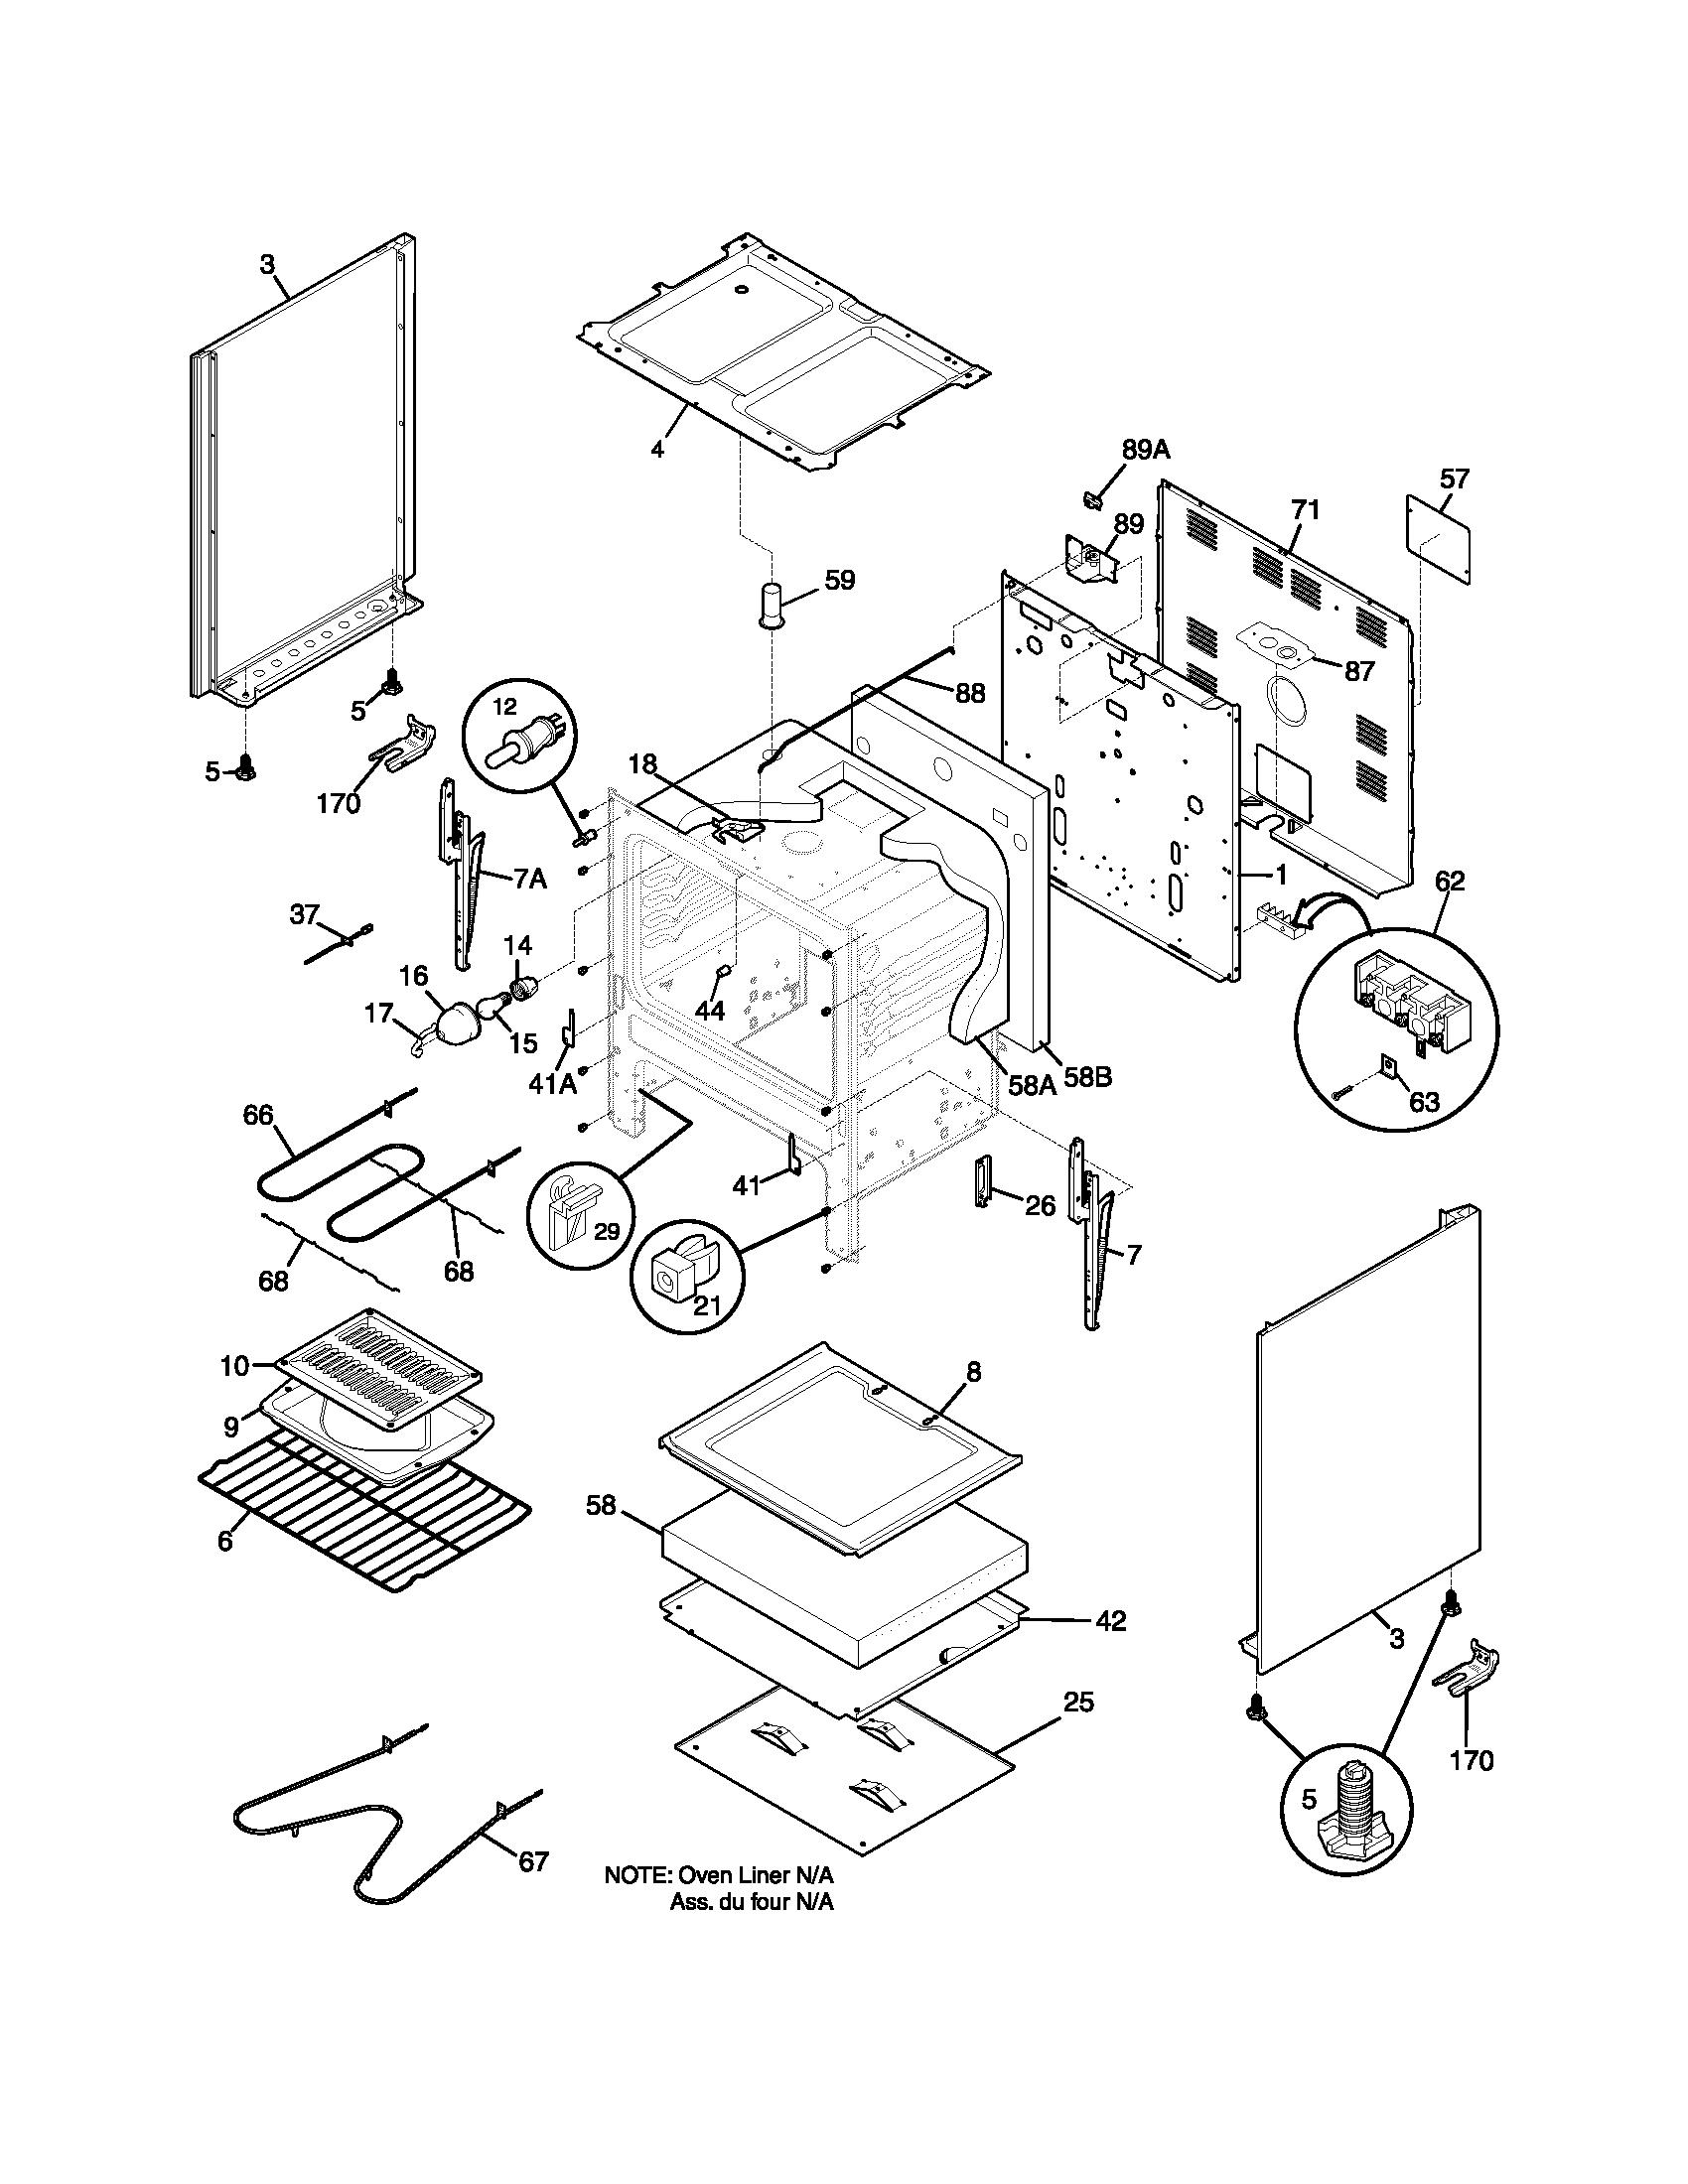 Honda Ct110 Electrical Diagram 1982 Wiring Delighted Ideas Circuit Rheideteccom 2200